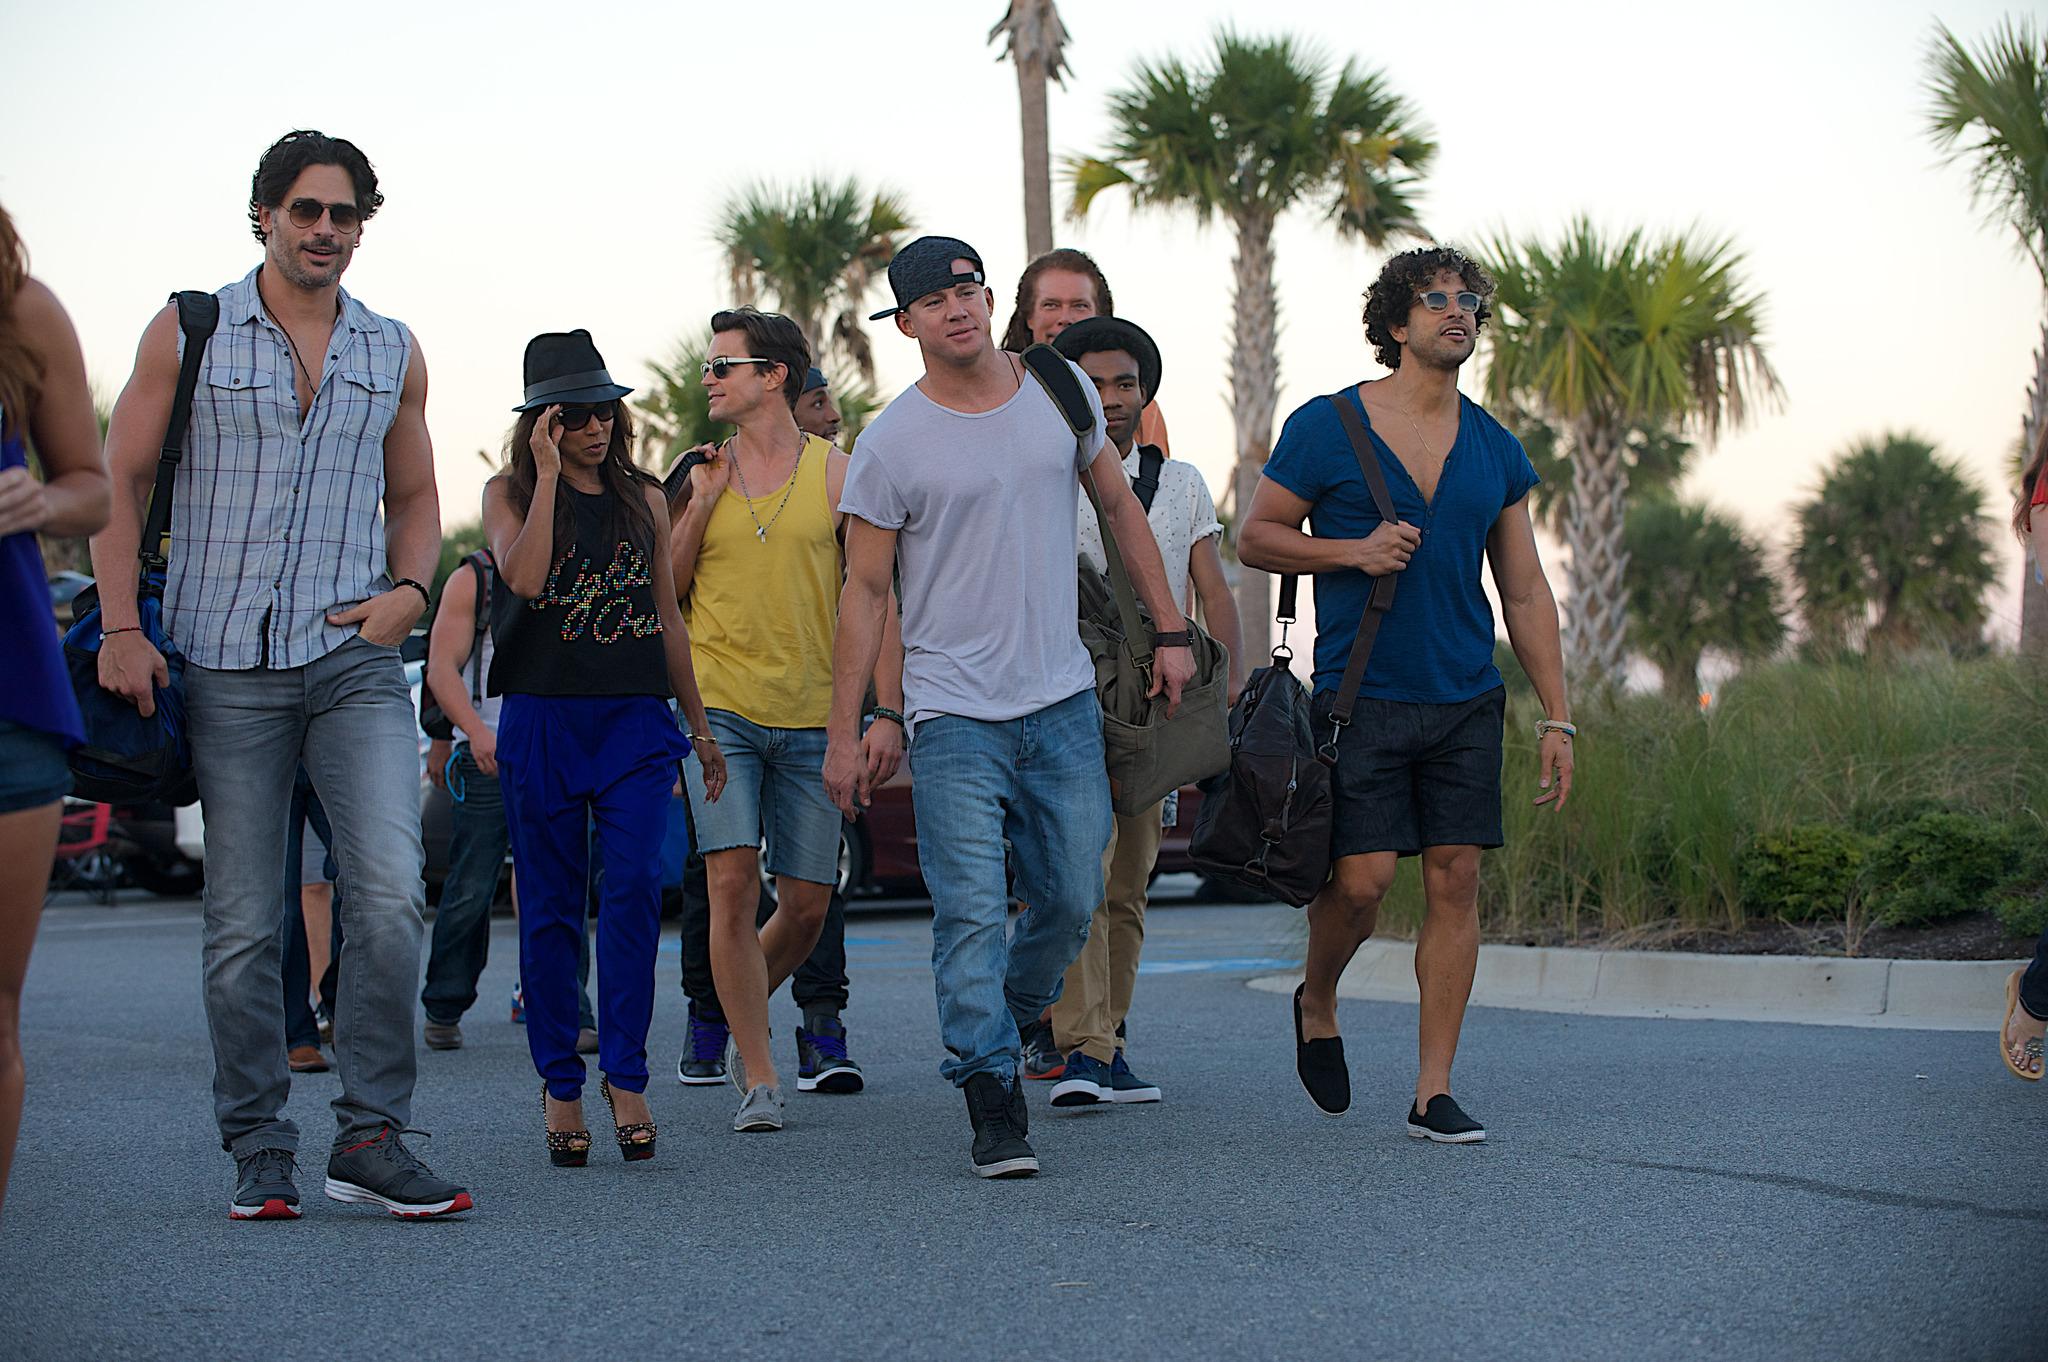 Still of Jada Pinkett Smith, Matt Bomer, Joe Manganiello, Kevin Nash, Adam Rodriguez and Channing Tatum in Magiskasis Maikas XXL (2015)